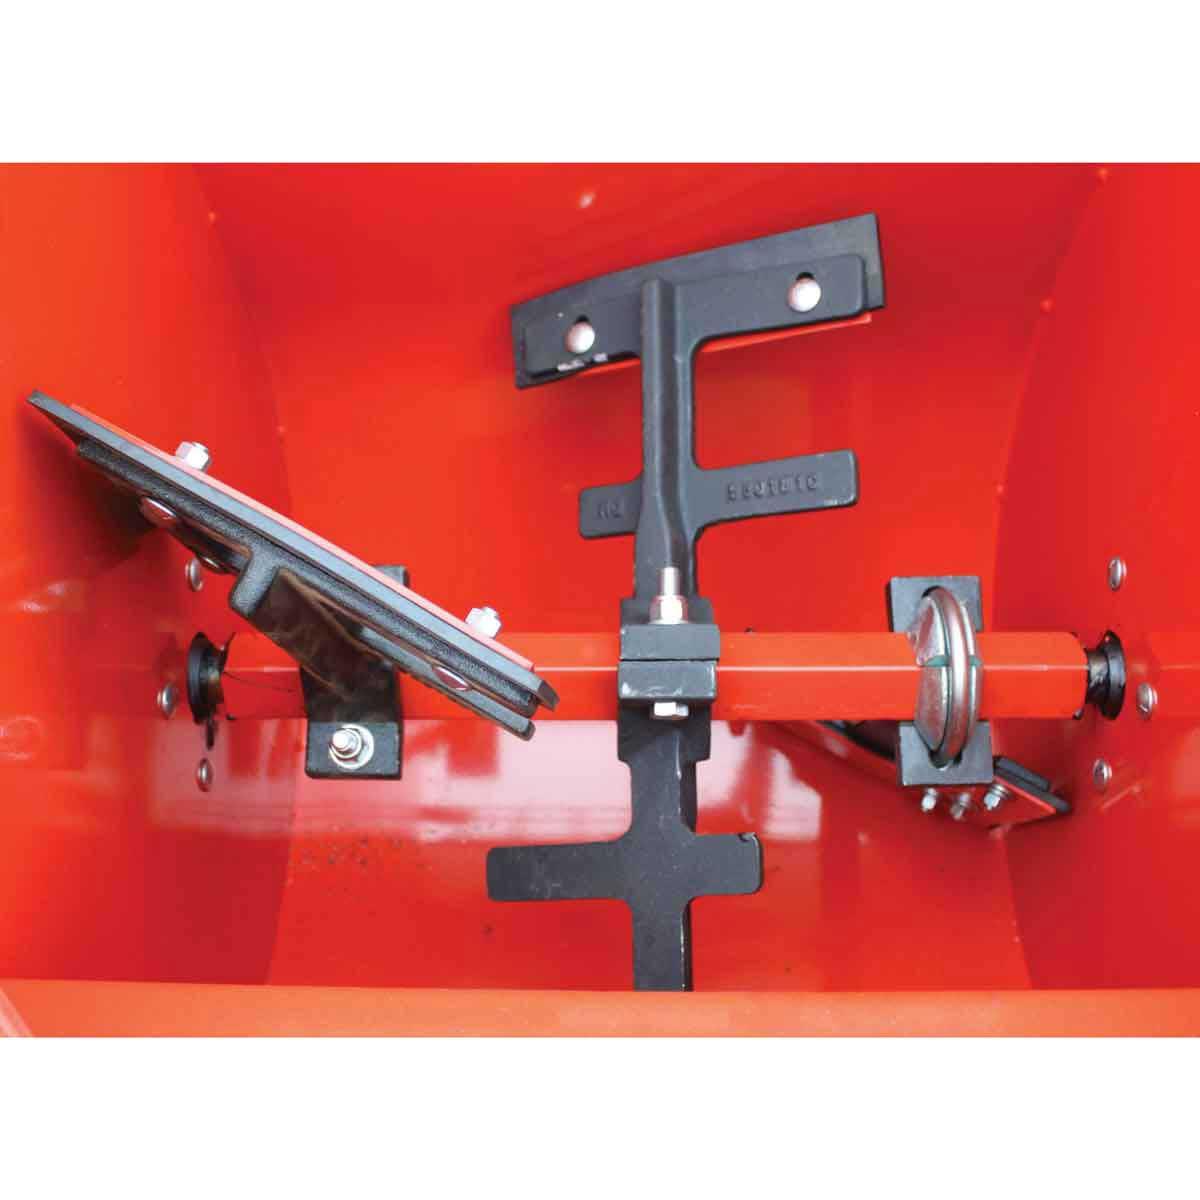 Multiquip Mortar Mixer paddles